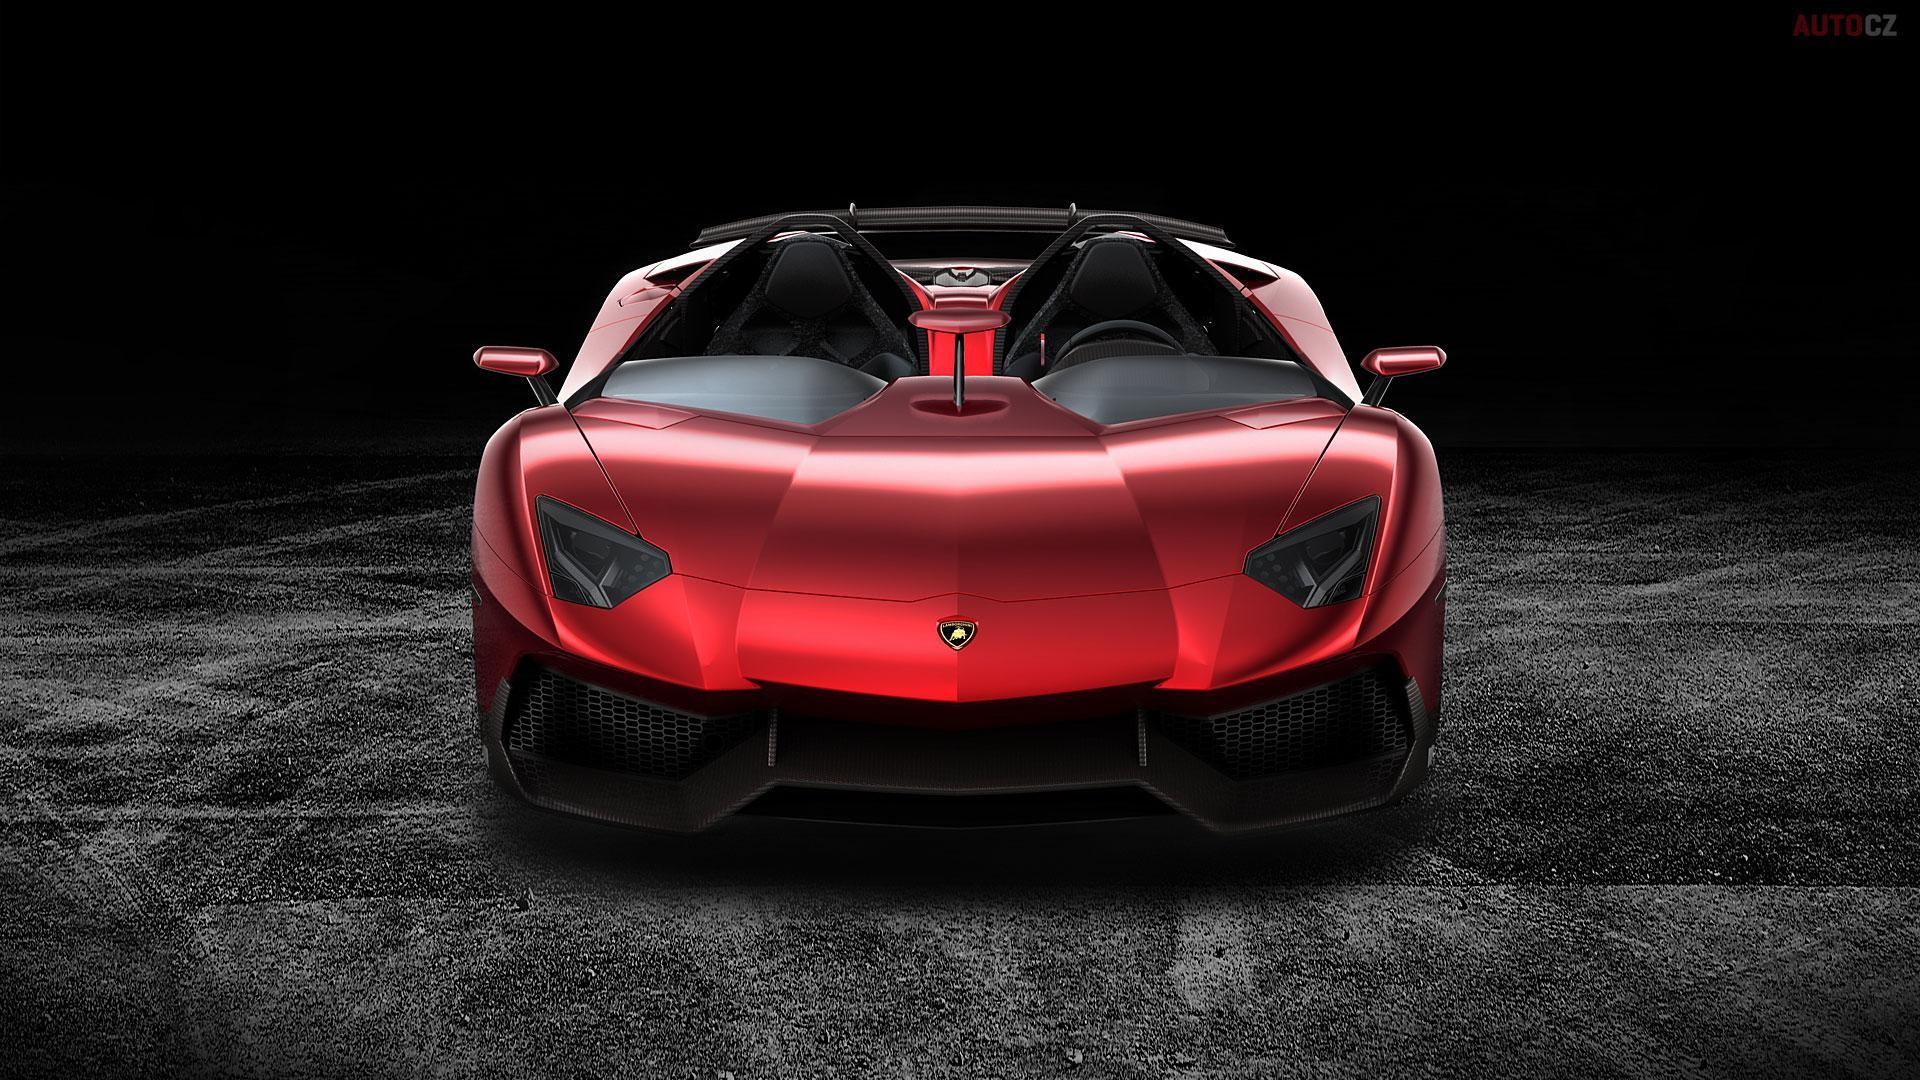 Lamborghini Sesto Elemento Wallpapers 81 Pictures